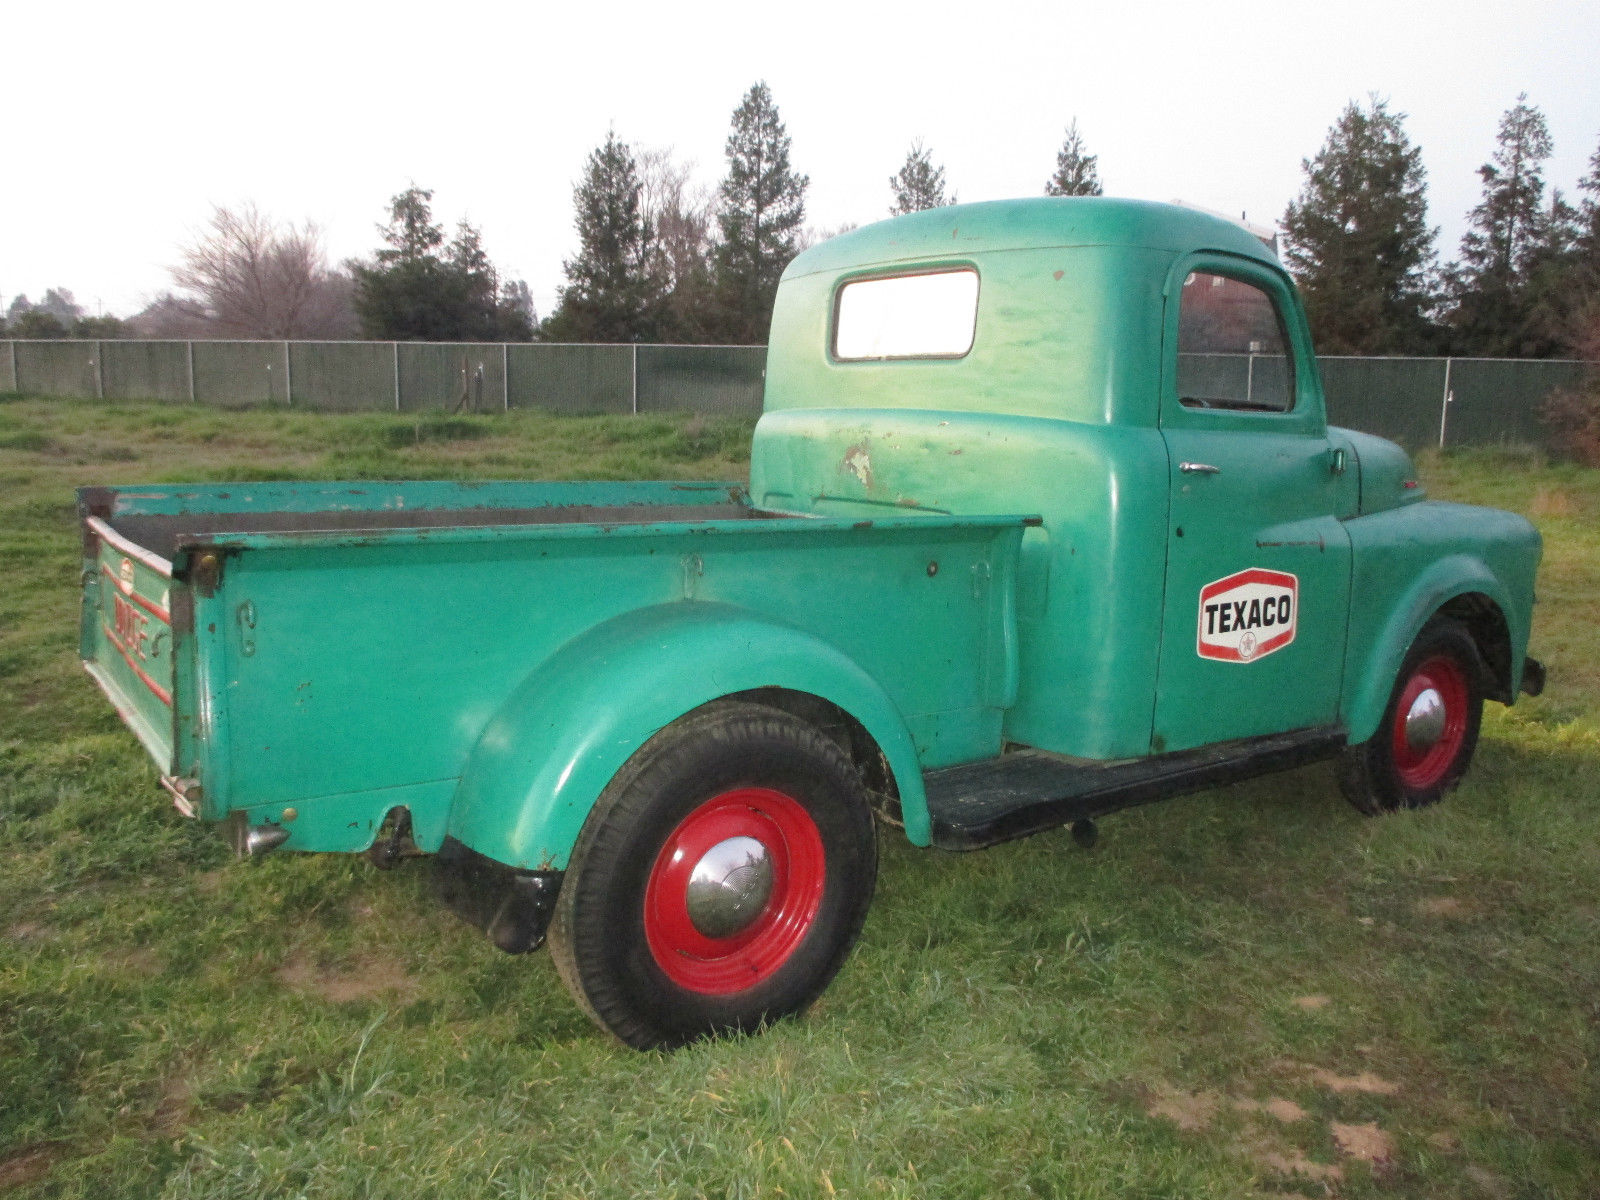 1951 Dodge Pickup Truck B Series Texaco Shop Truck